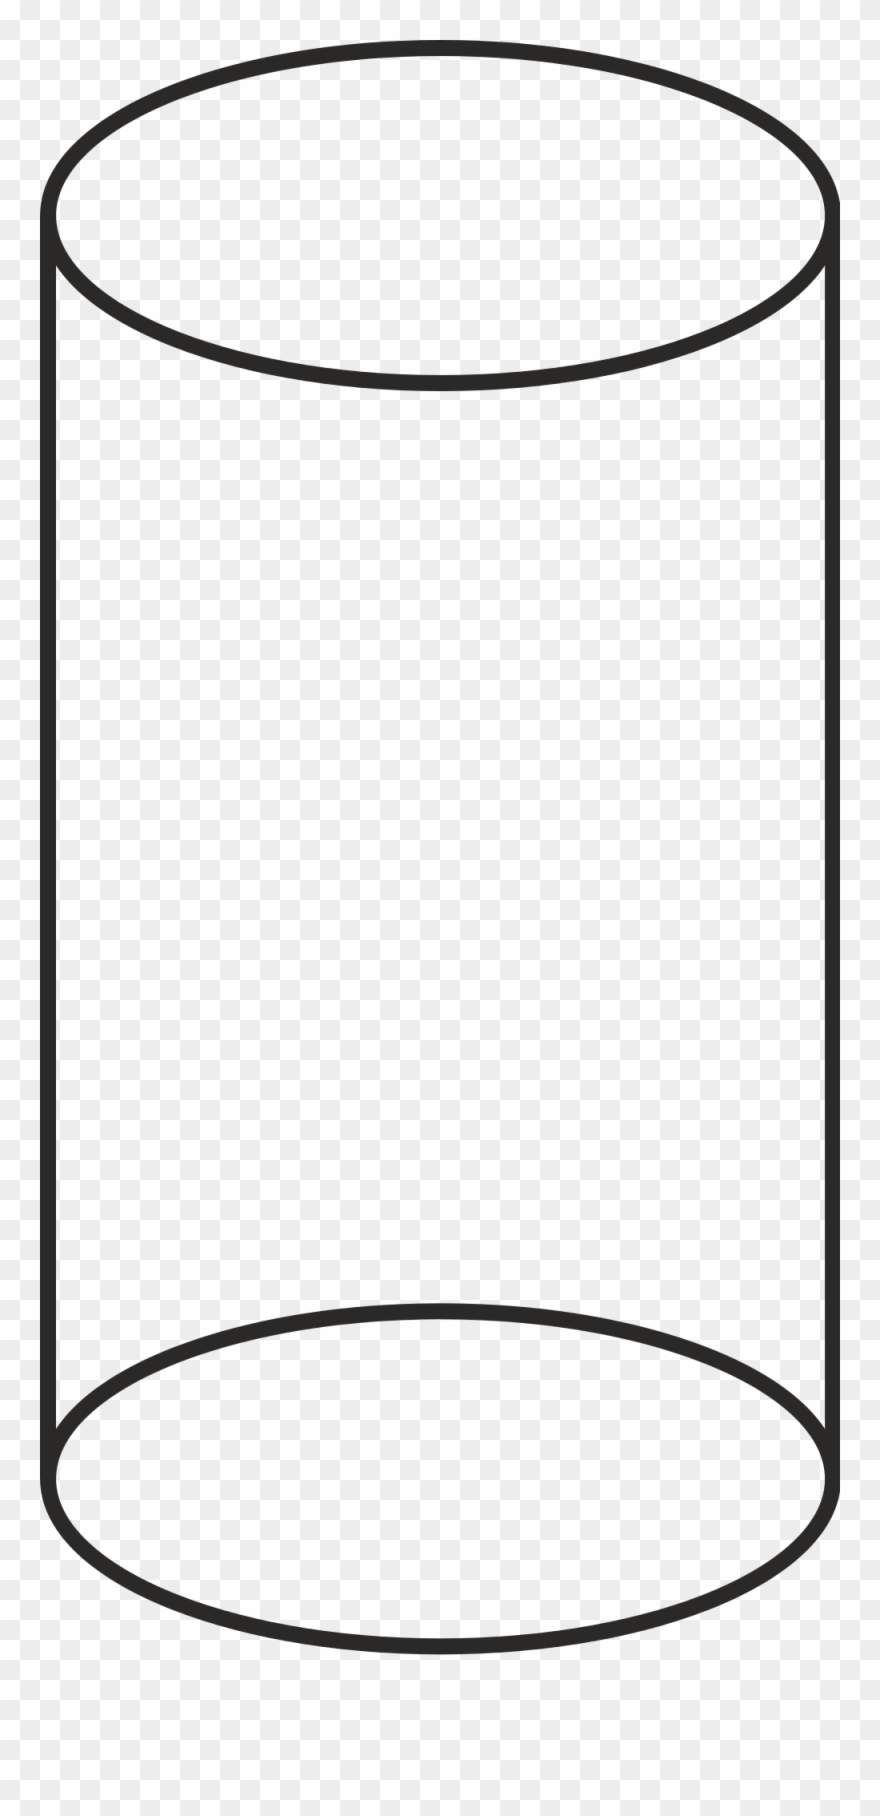 White cylinder clipart jpg freeuse library Volume Cilinder Vector - Cylinder Shape Black And White Clipart ... jpg freeuse library